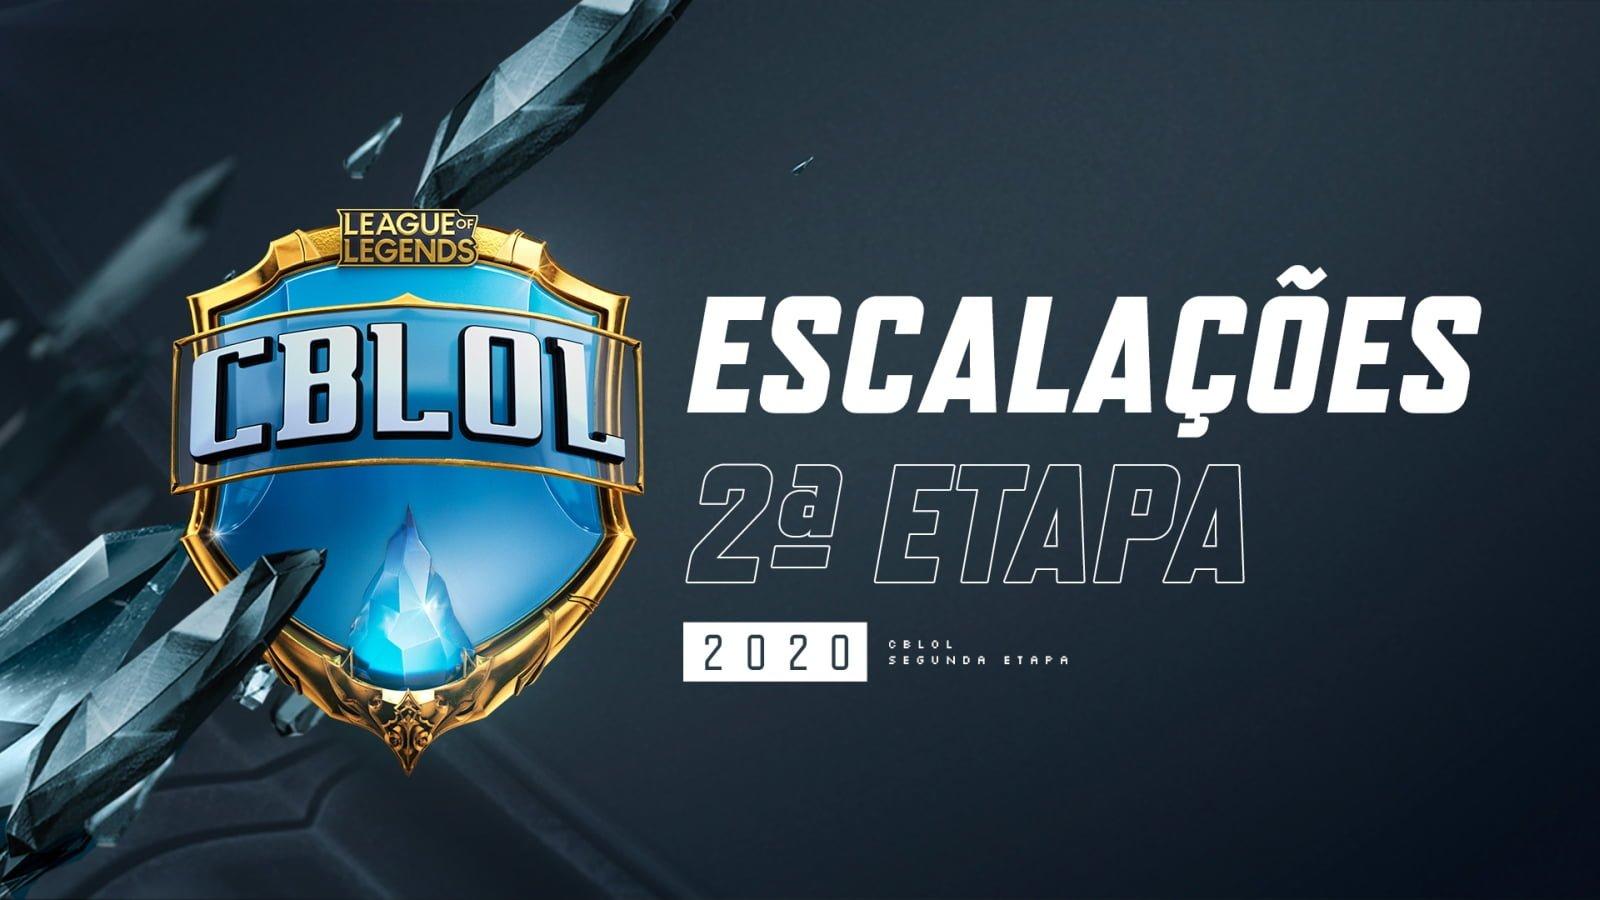 Escalações CbLoL 2020 2º Split